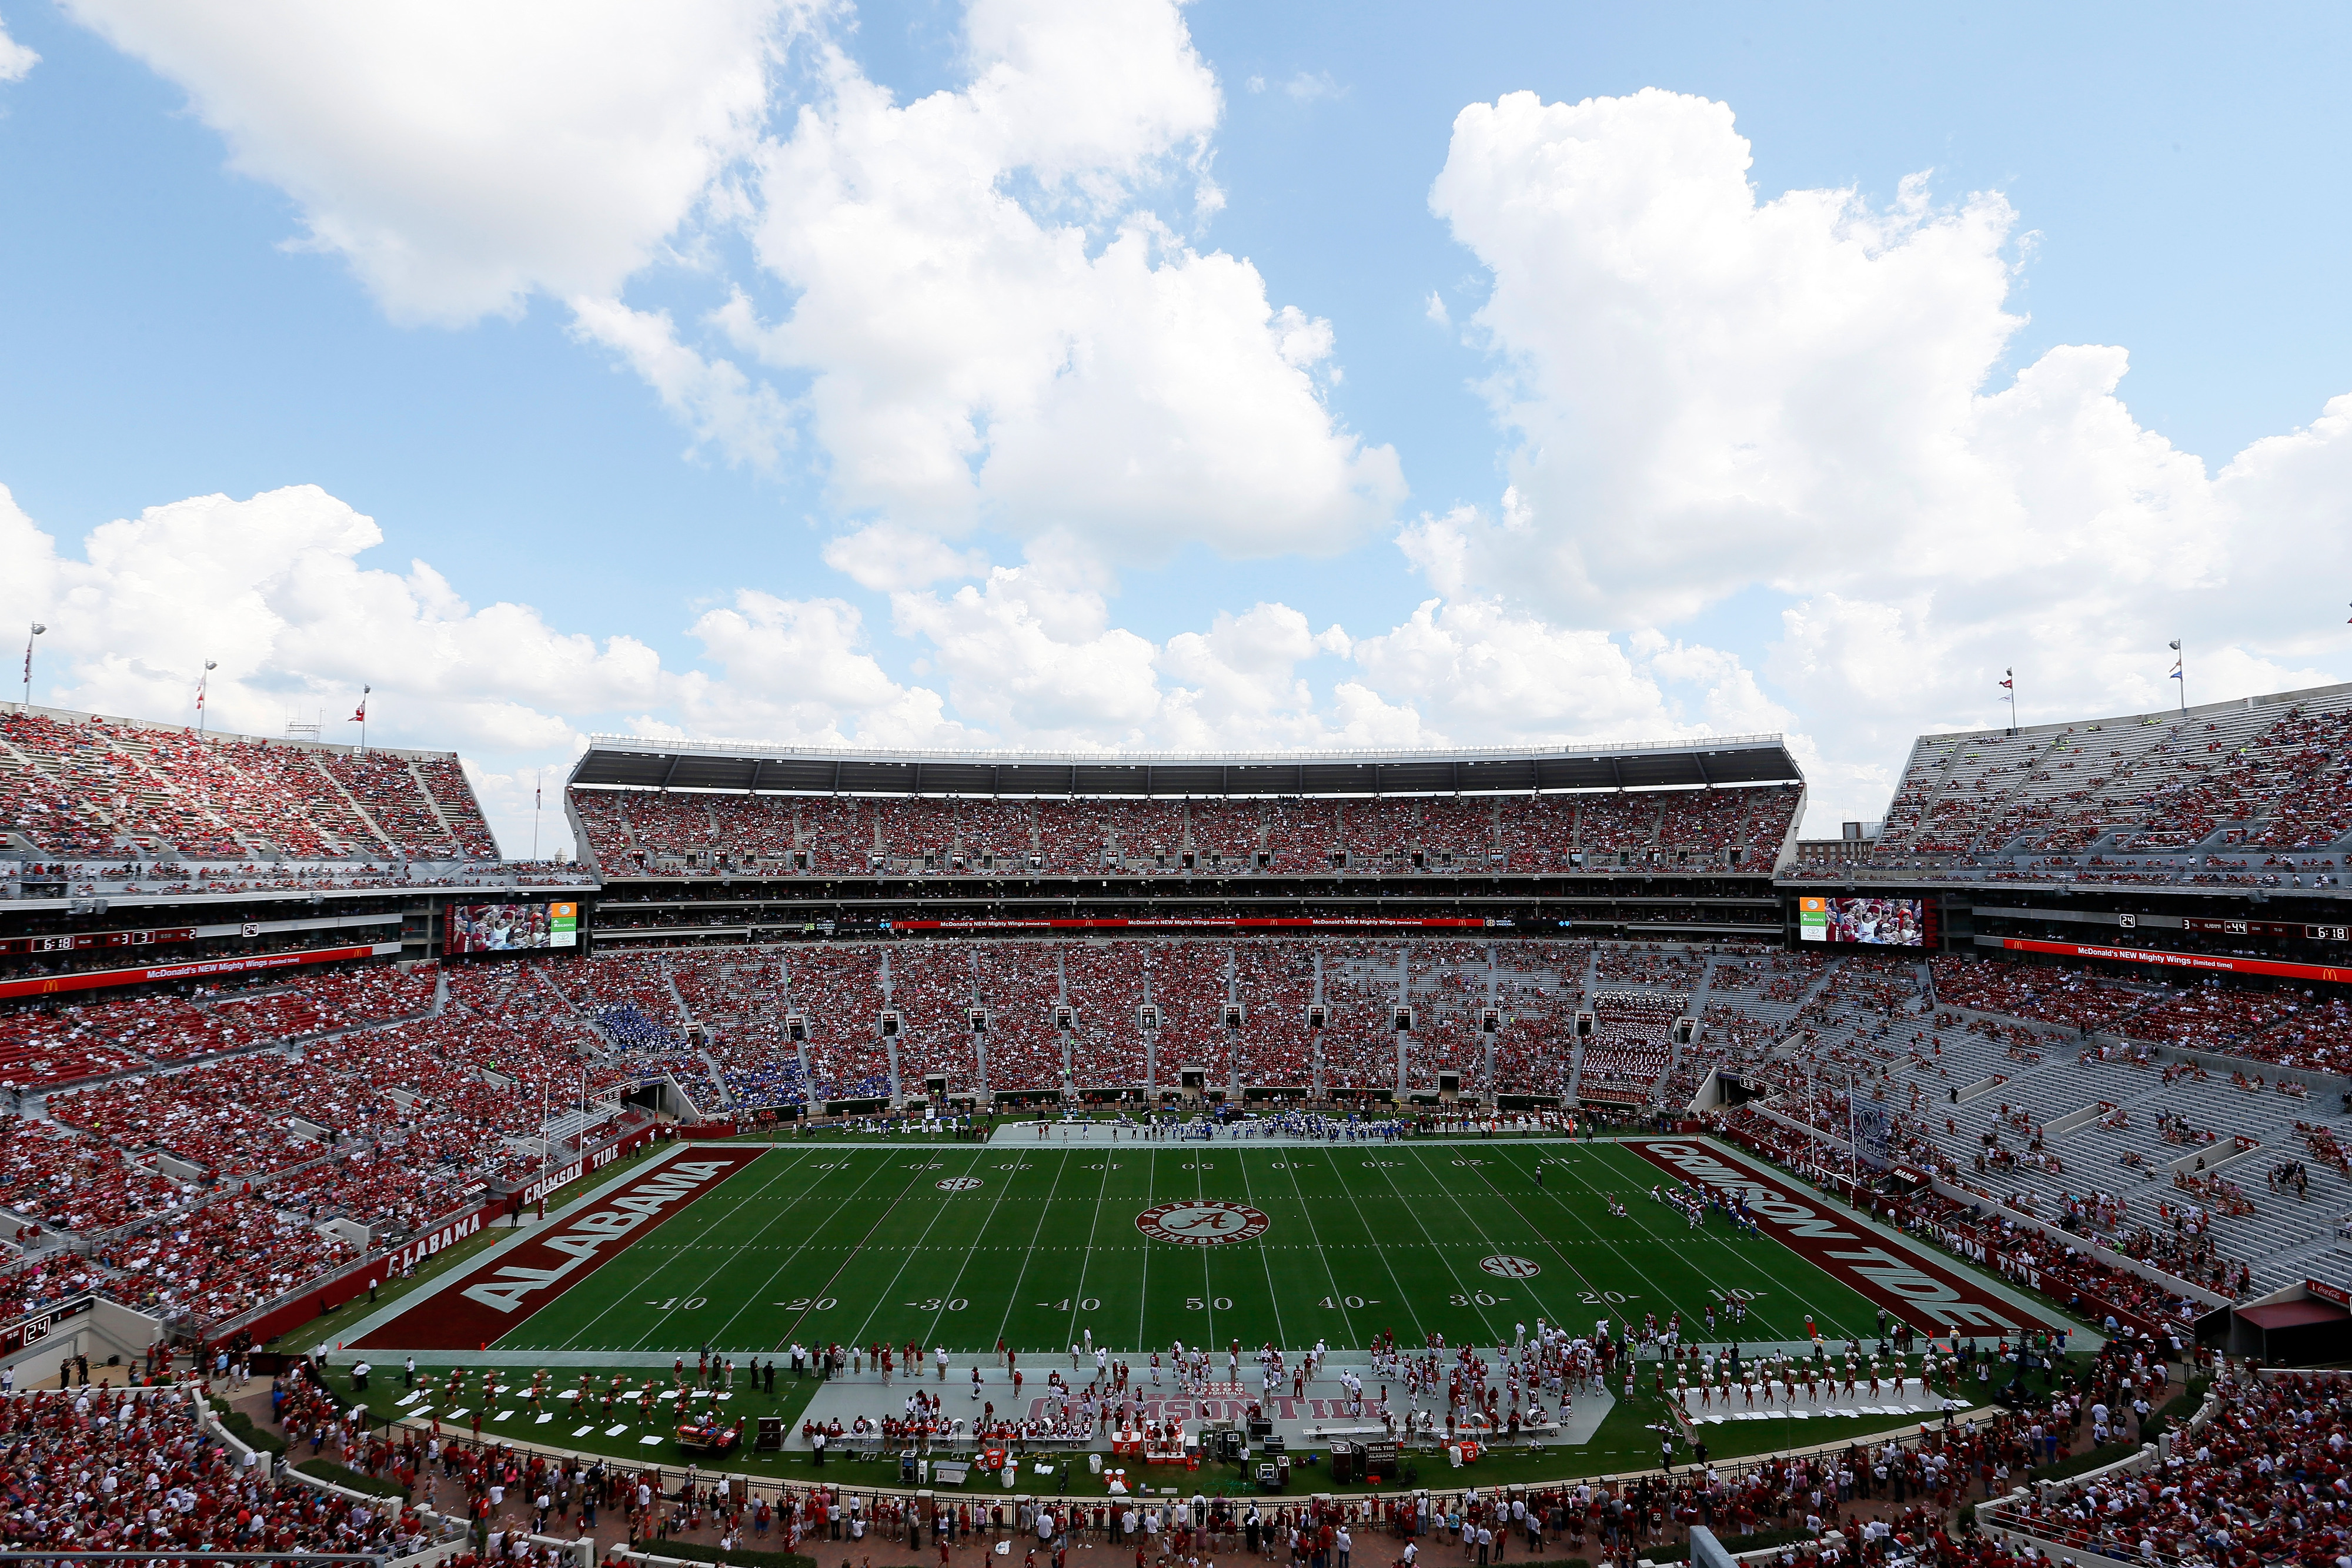 2014 spring game attendance rankings: Alabama, Penn State, Auburn lead the way